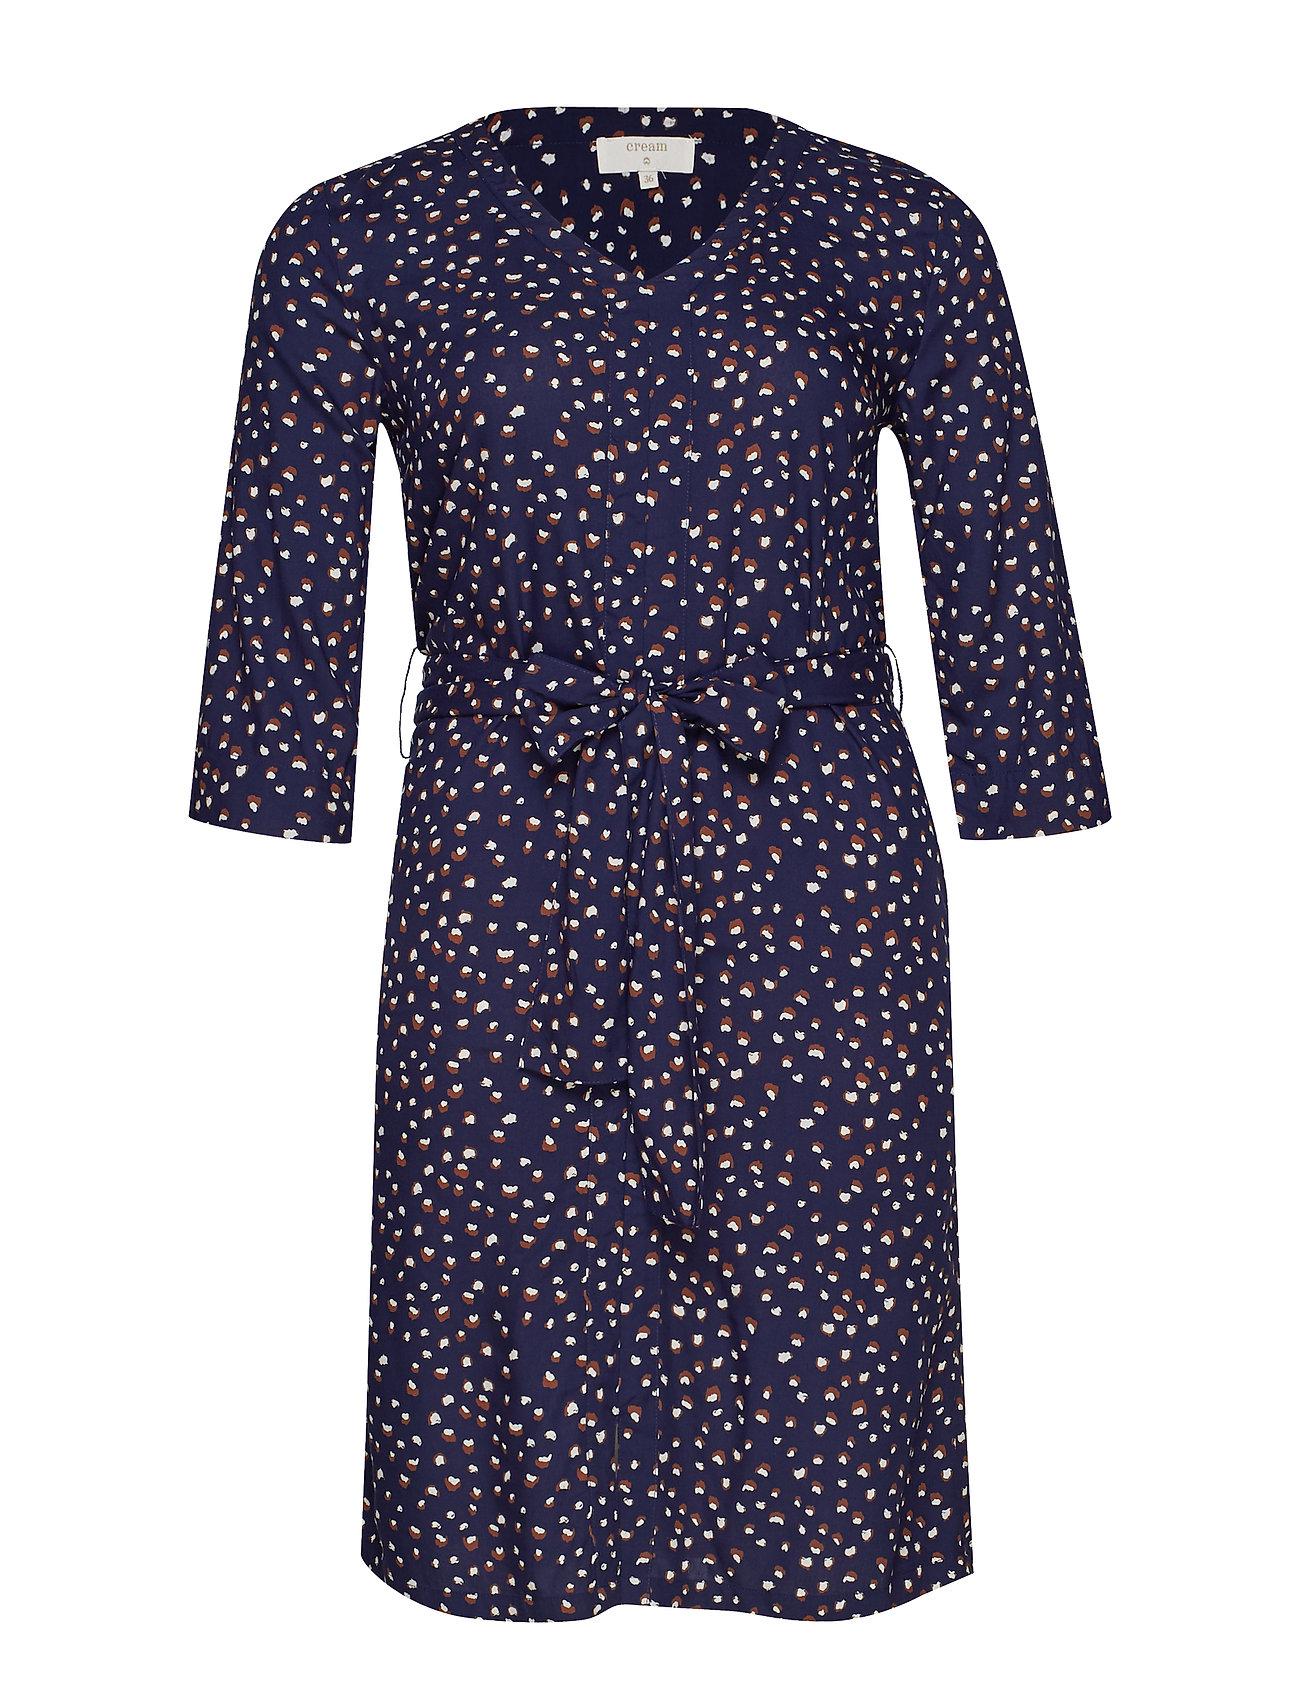 Cream Gemina Tie Dress - MARITIME BLUE